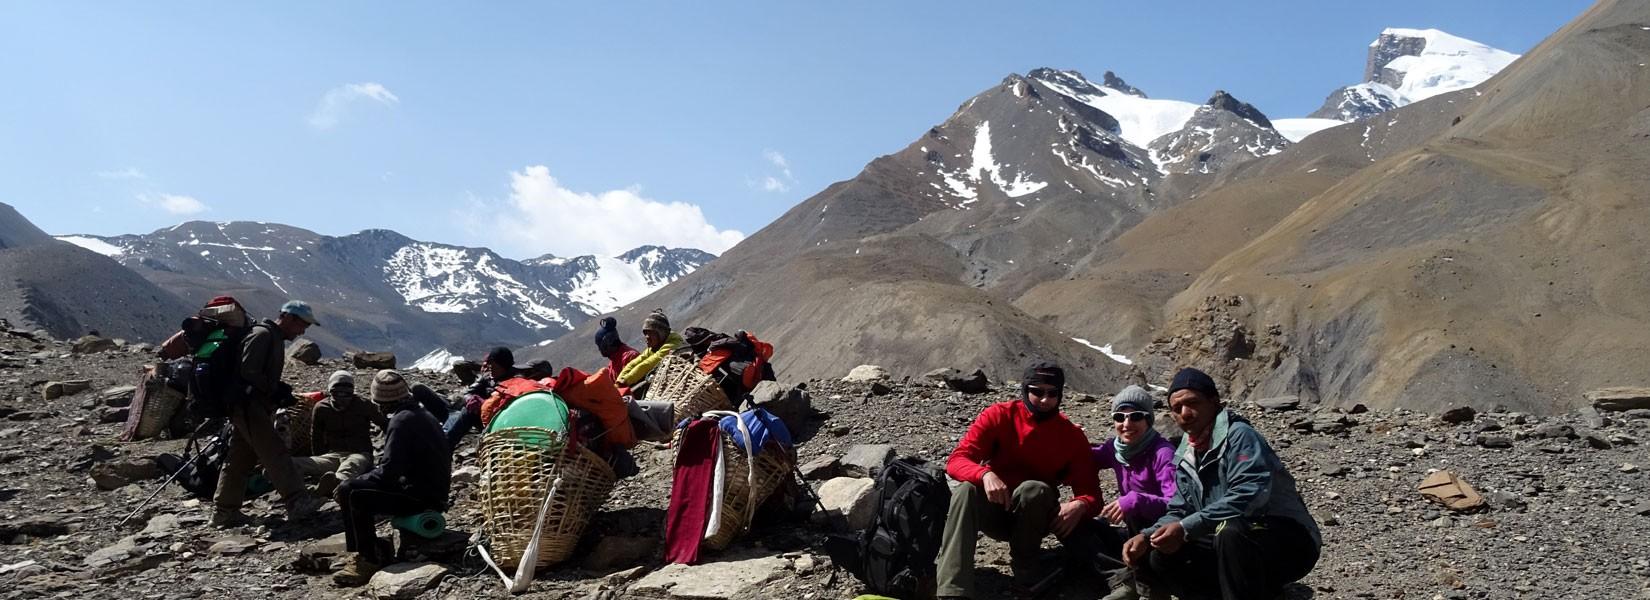 Trekking Guide Hire in Nepal